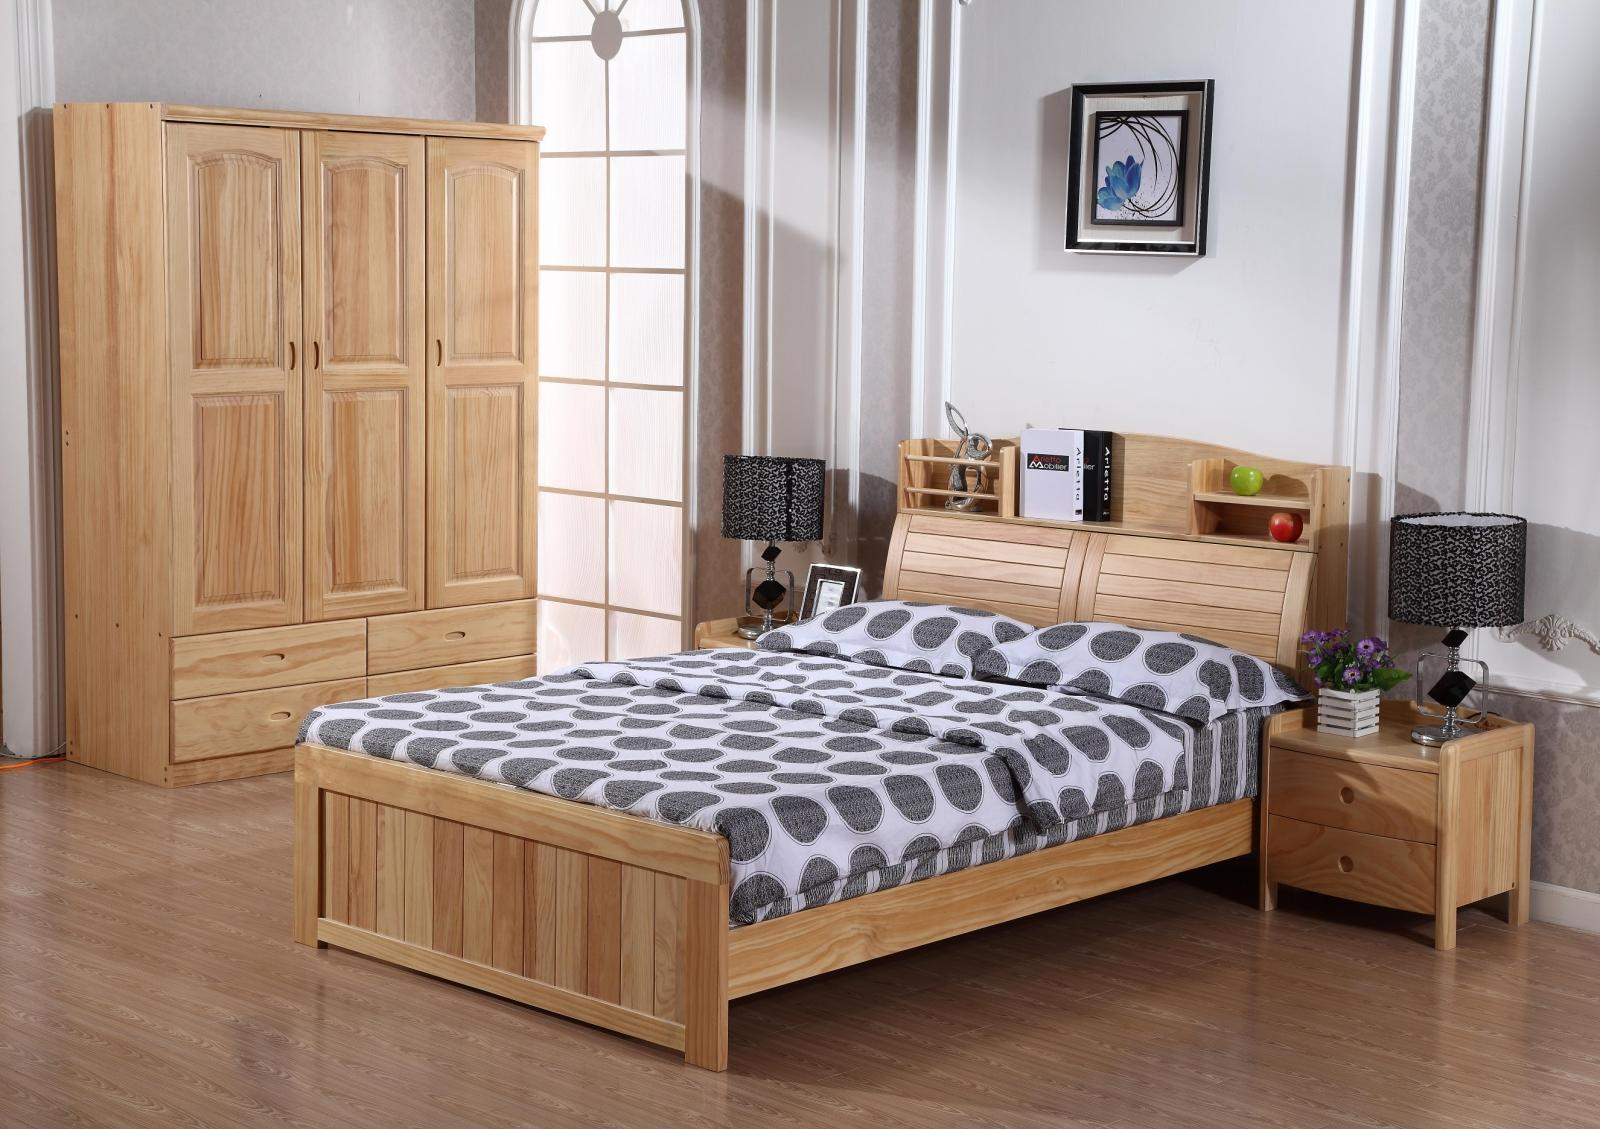 Medium Of Solid Wood Bedroom Furniture